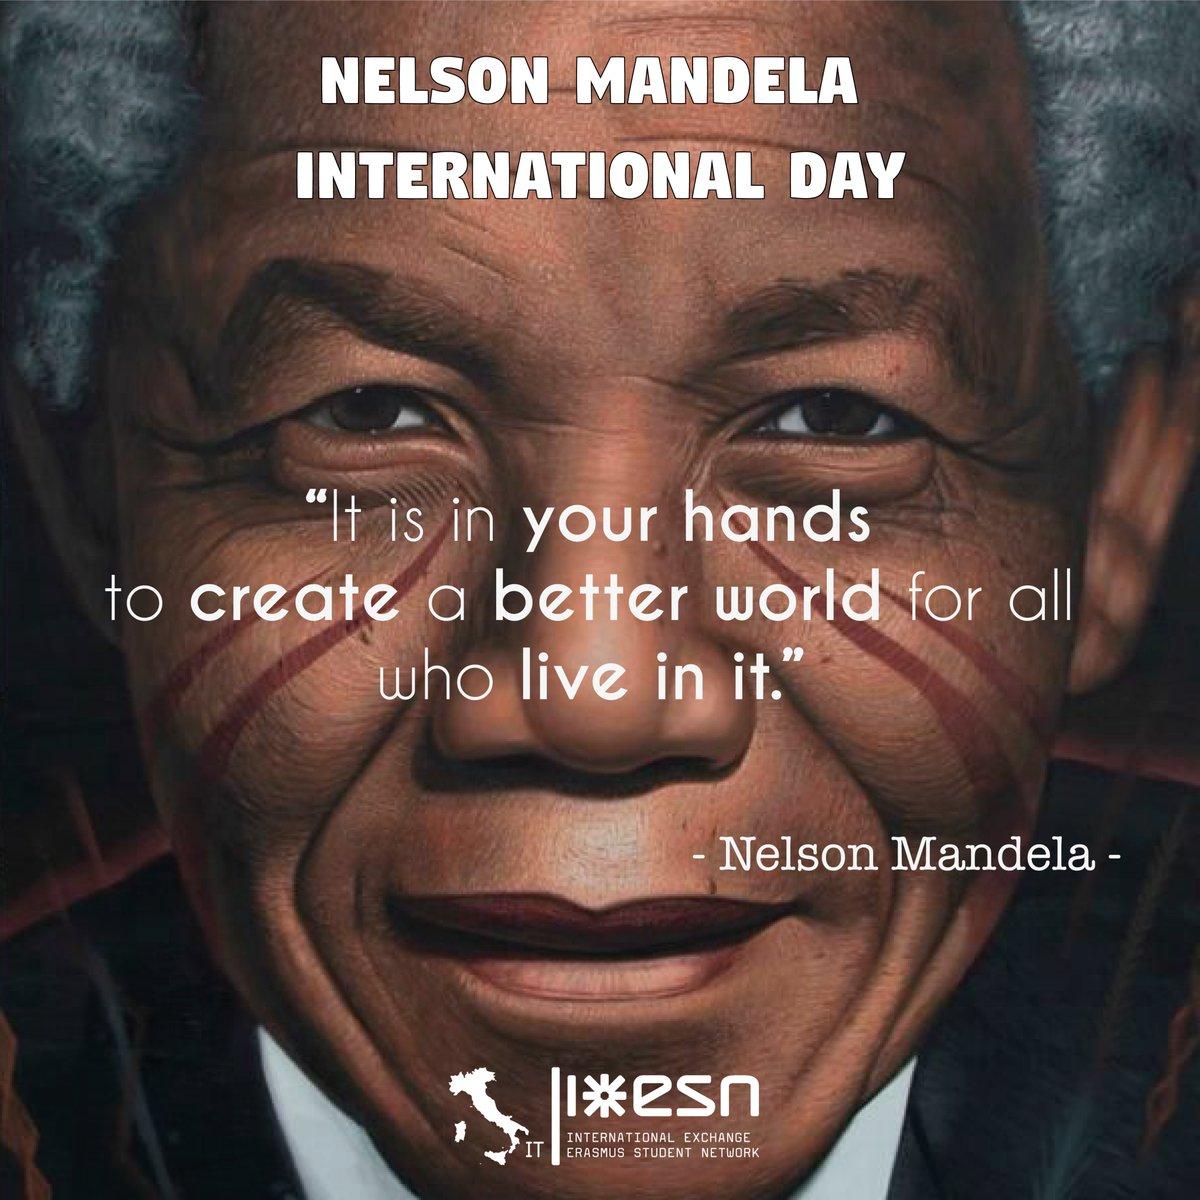 #NelsonMandelaDay